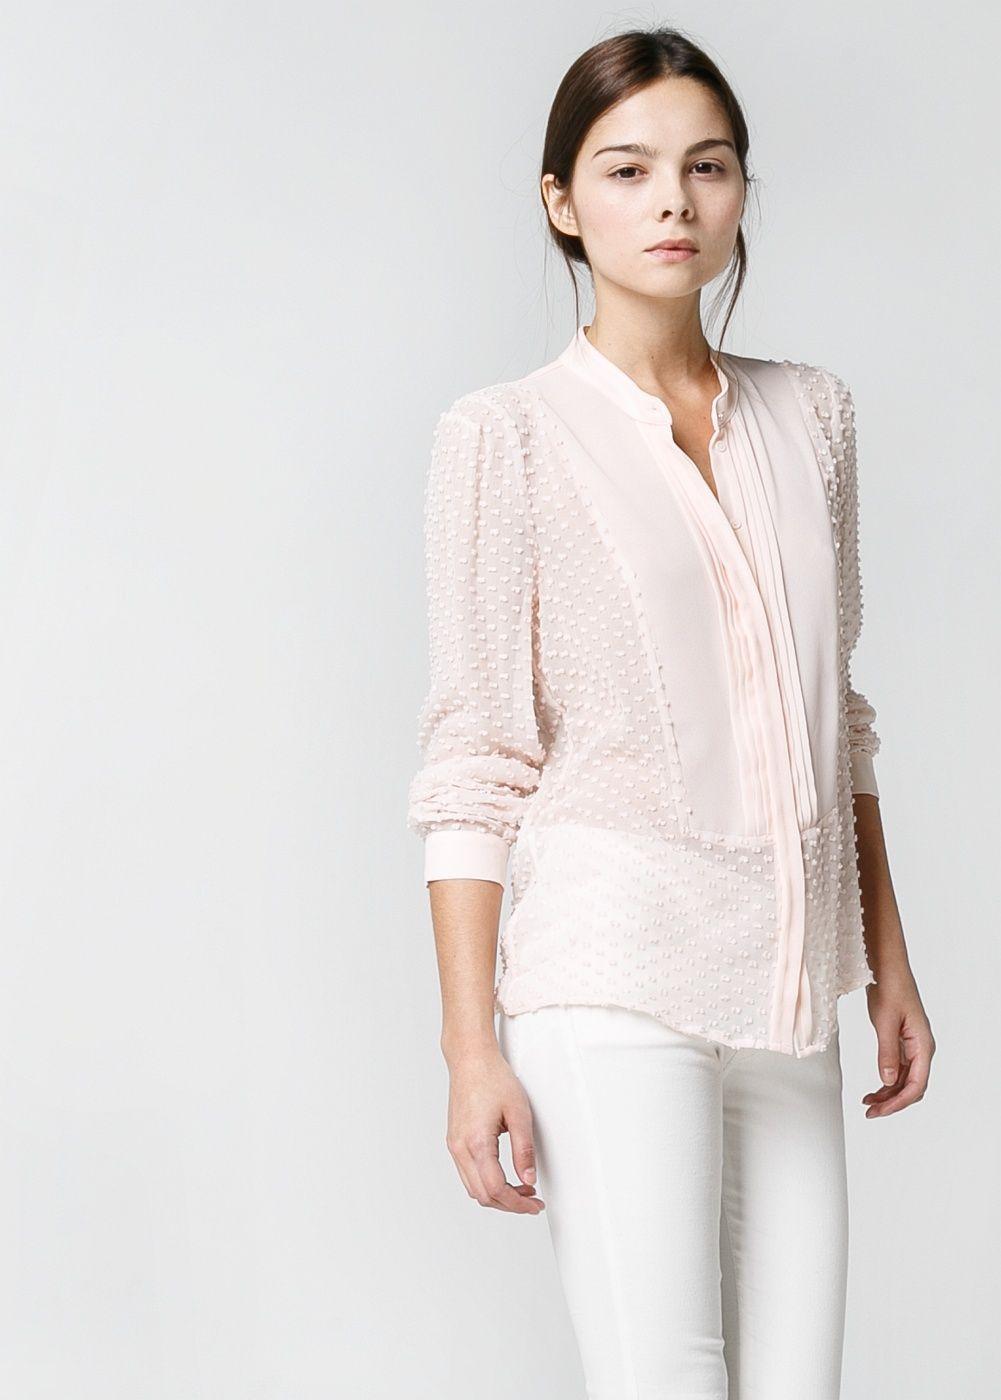 acfb4b2cad36ed Silk-blend plumeti blouse in nude...pretty